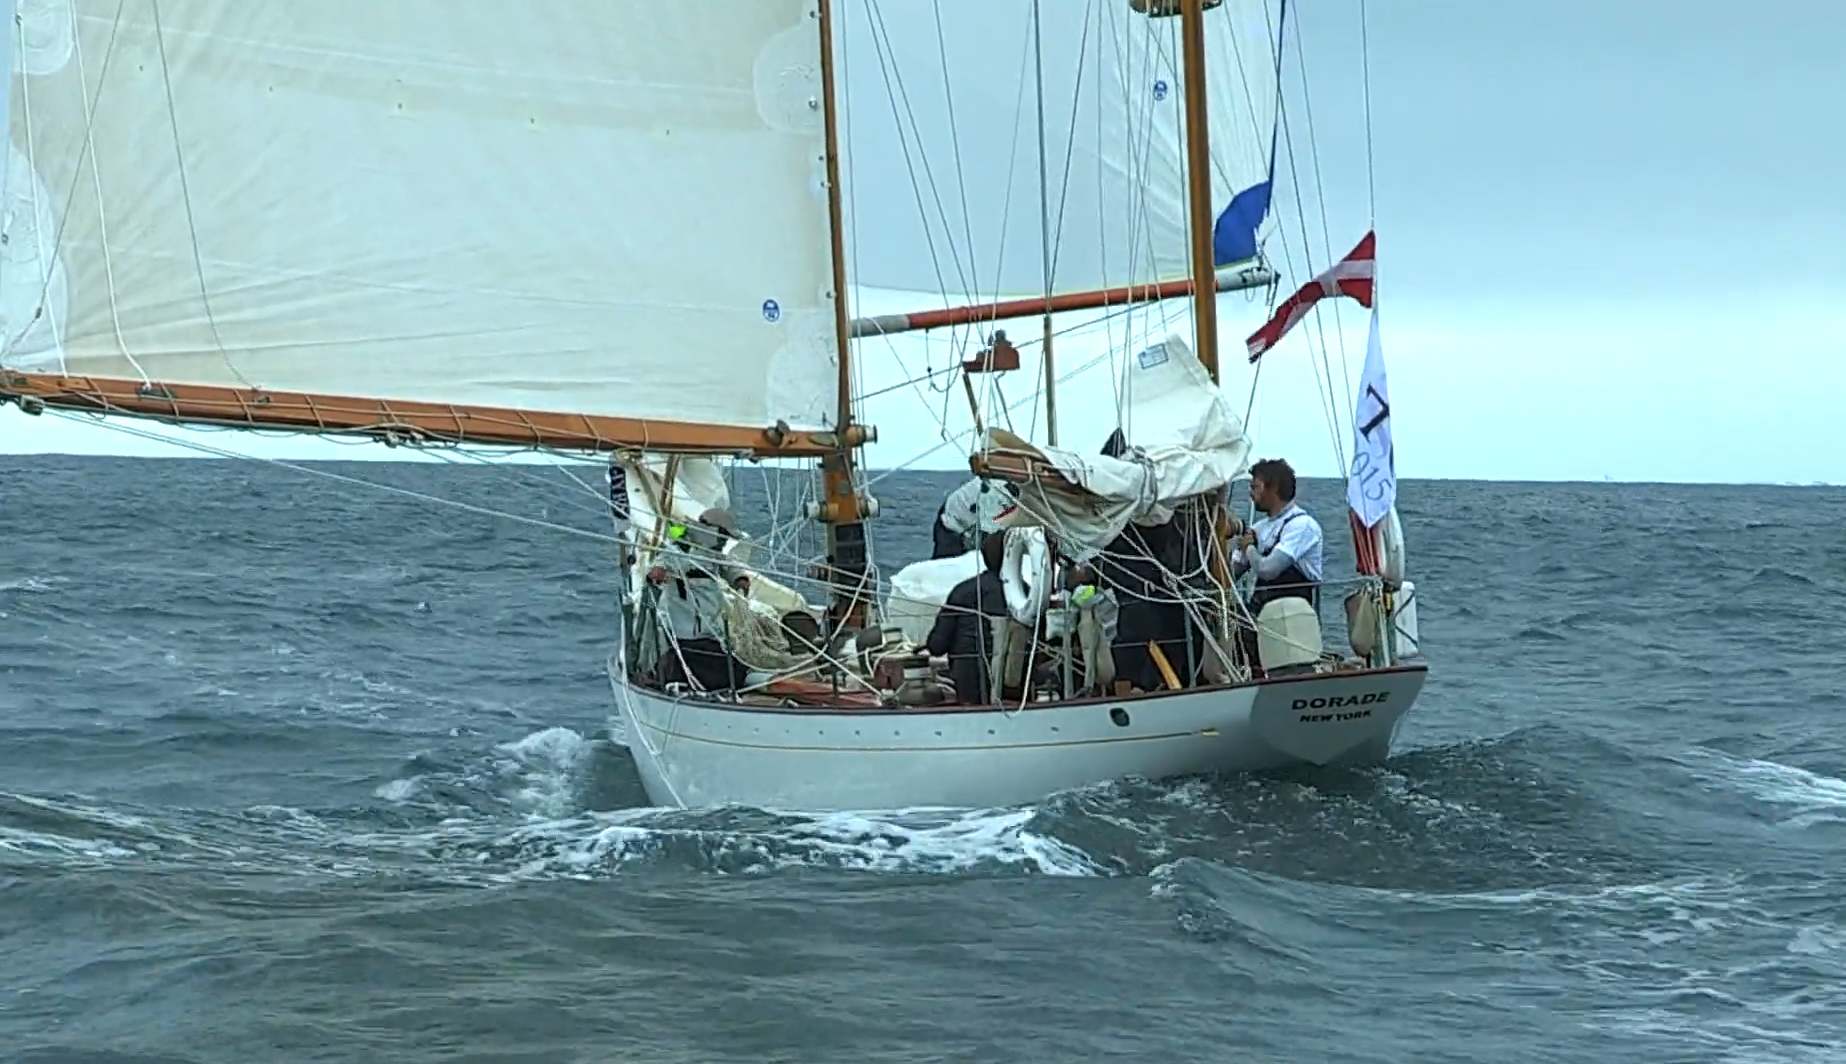 TR_classic-yacht-tv_Dorade1_TransatlanticRace2015.jpg